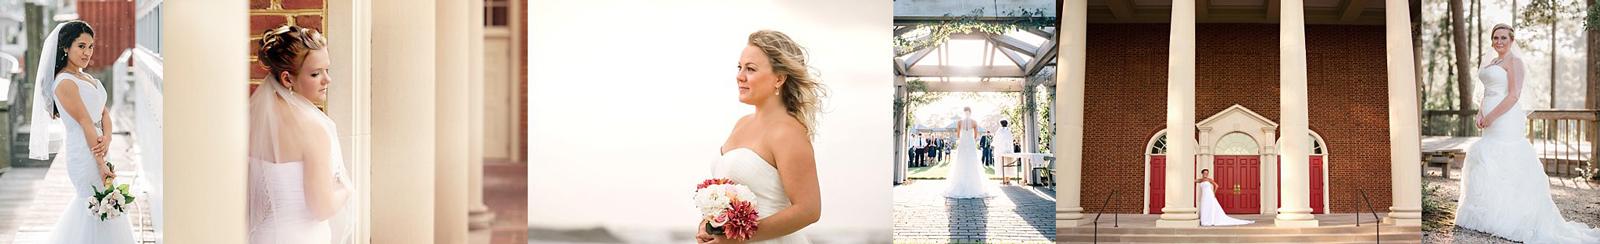 wedding-photographers-hampton-roads-va-williamsburg-norfolk-virginia-beach-va-wedding-photography